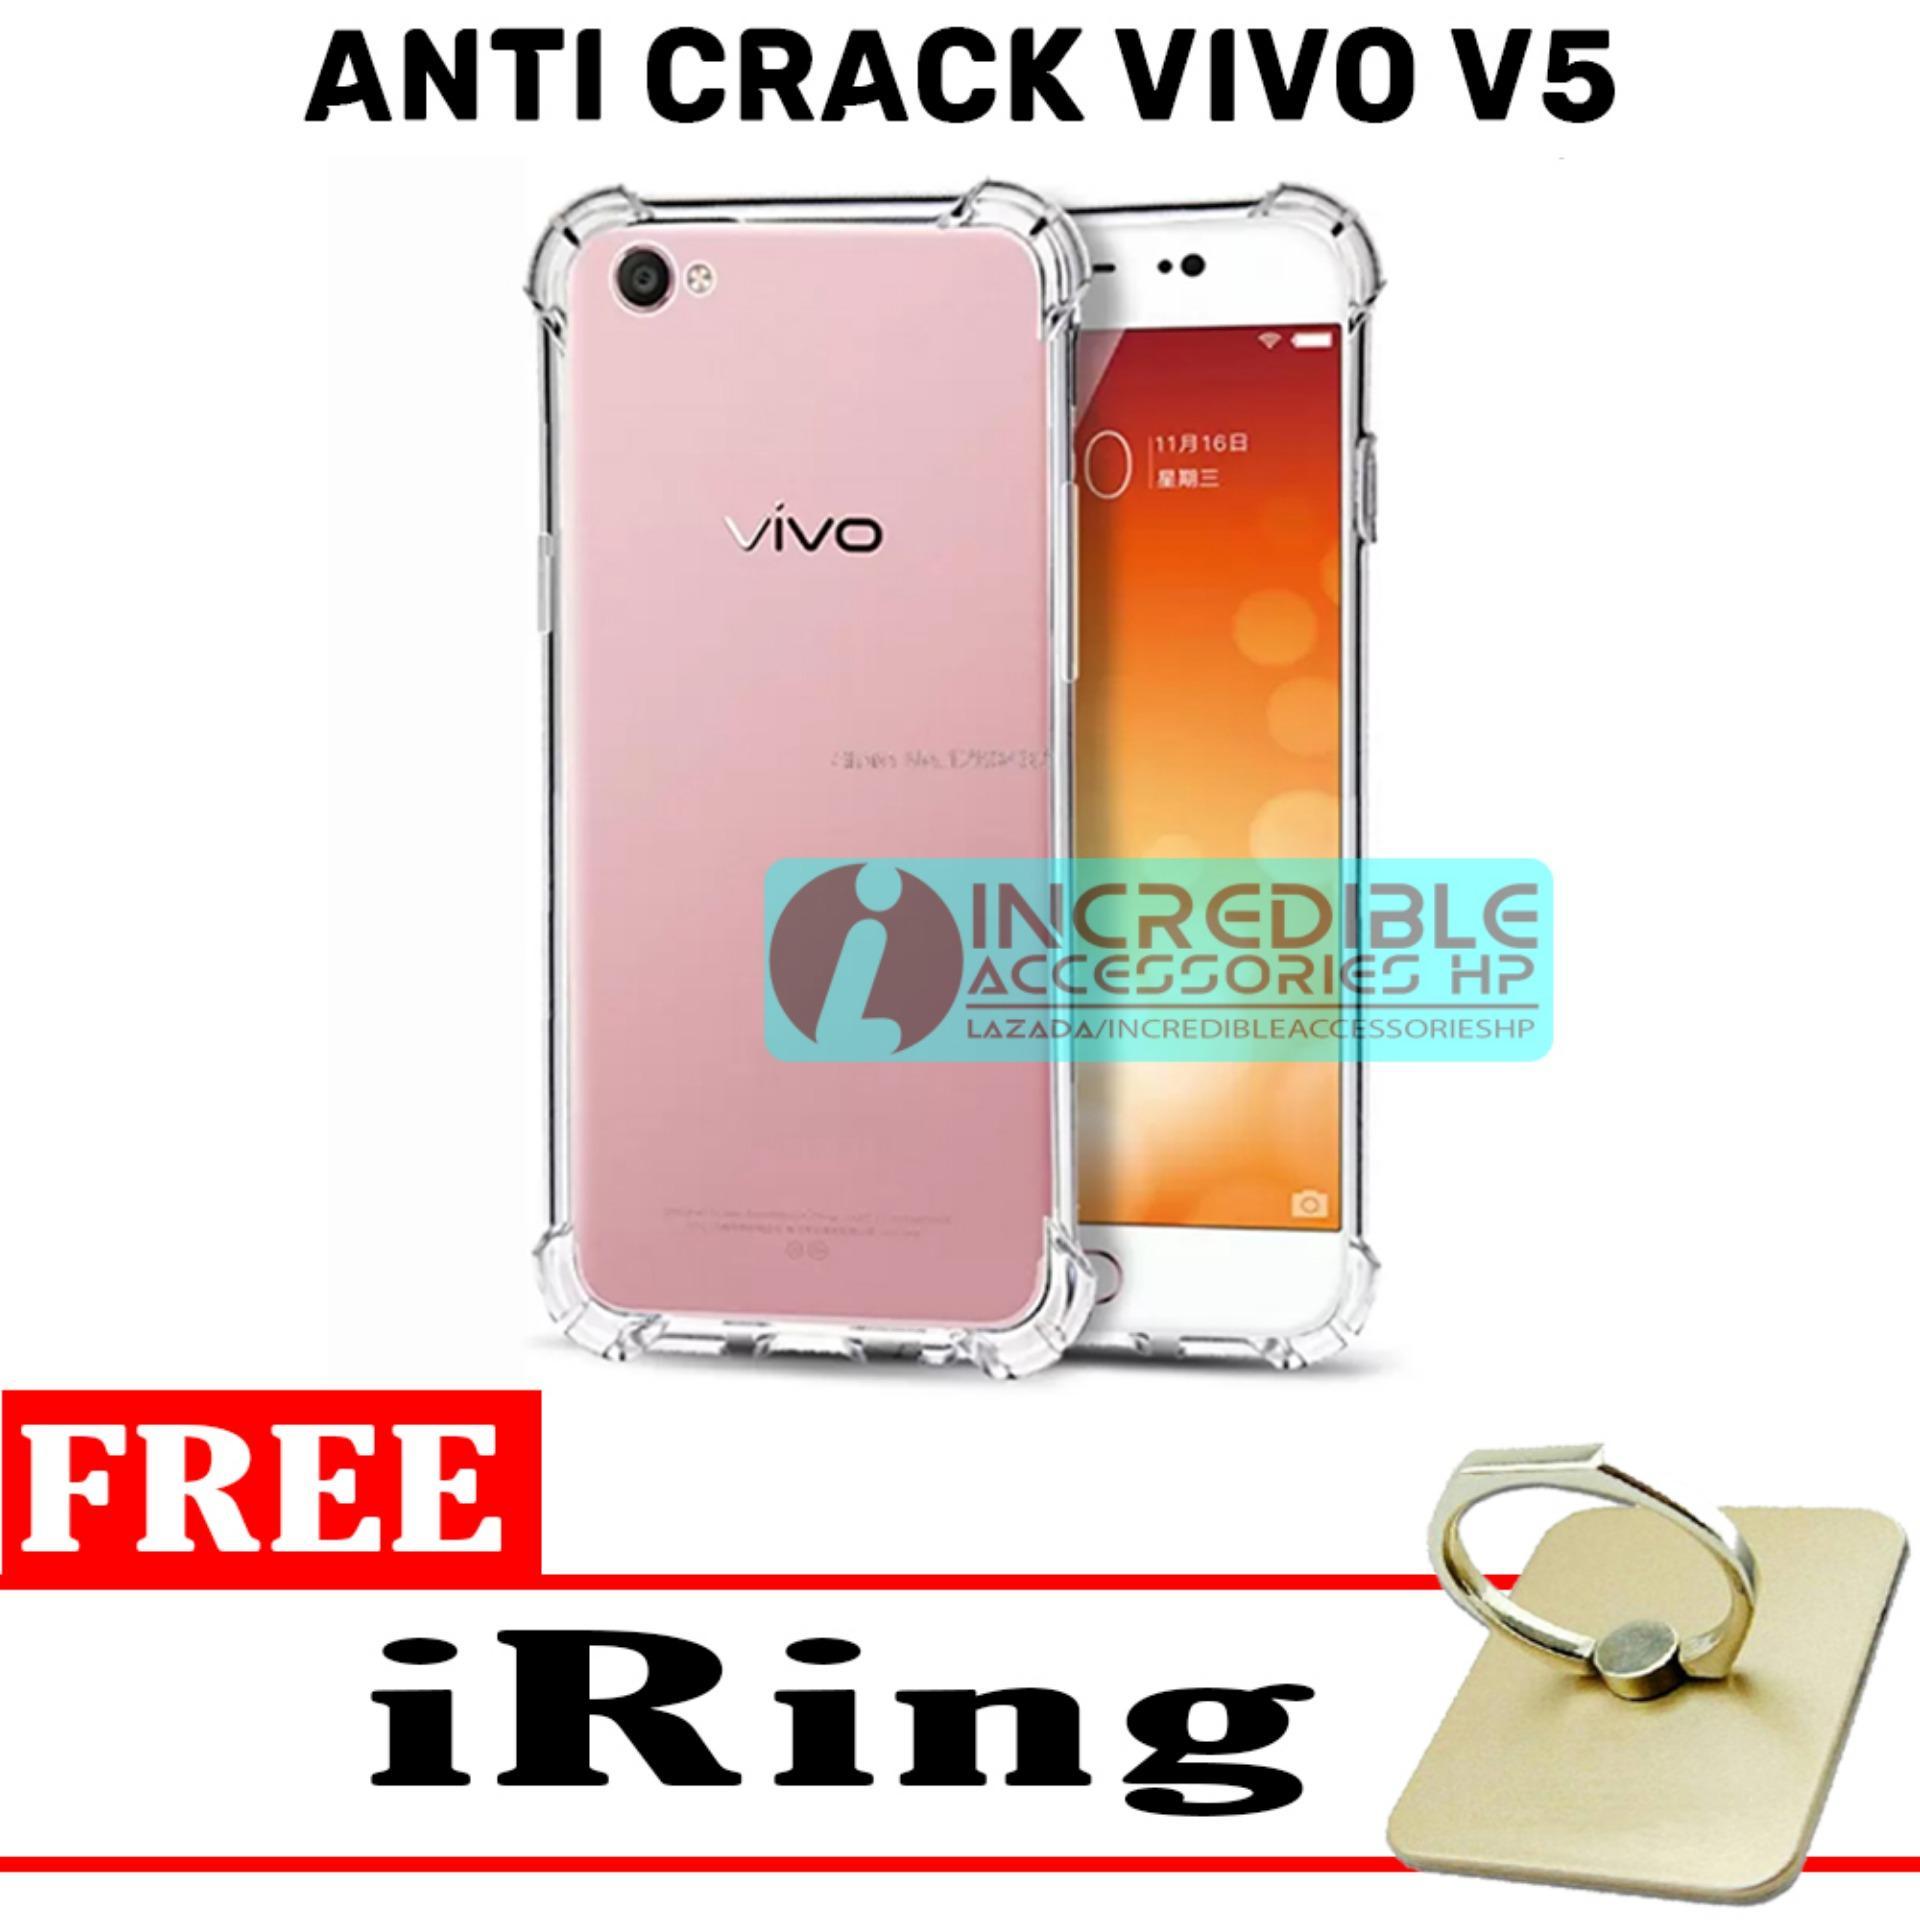 Case Chanel Softcase Tpu Cover Anti Shock Crack For Vivo V5 Meriah Ipaky Carbon V5s Series Elegant Y67 White